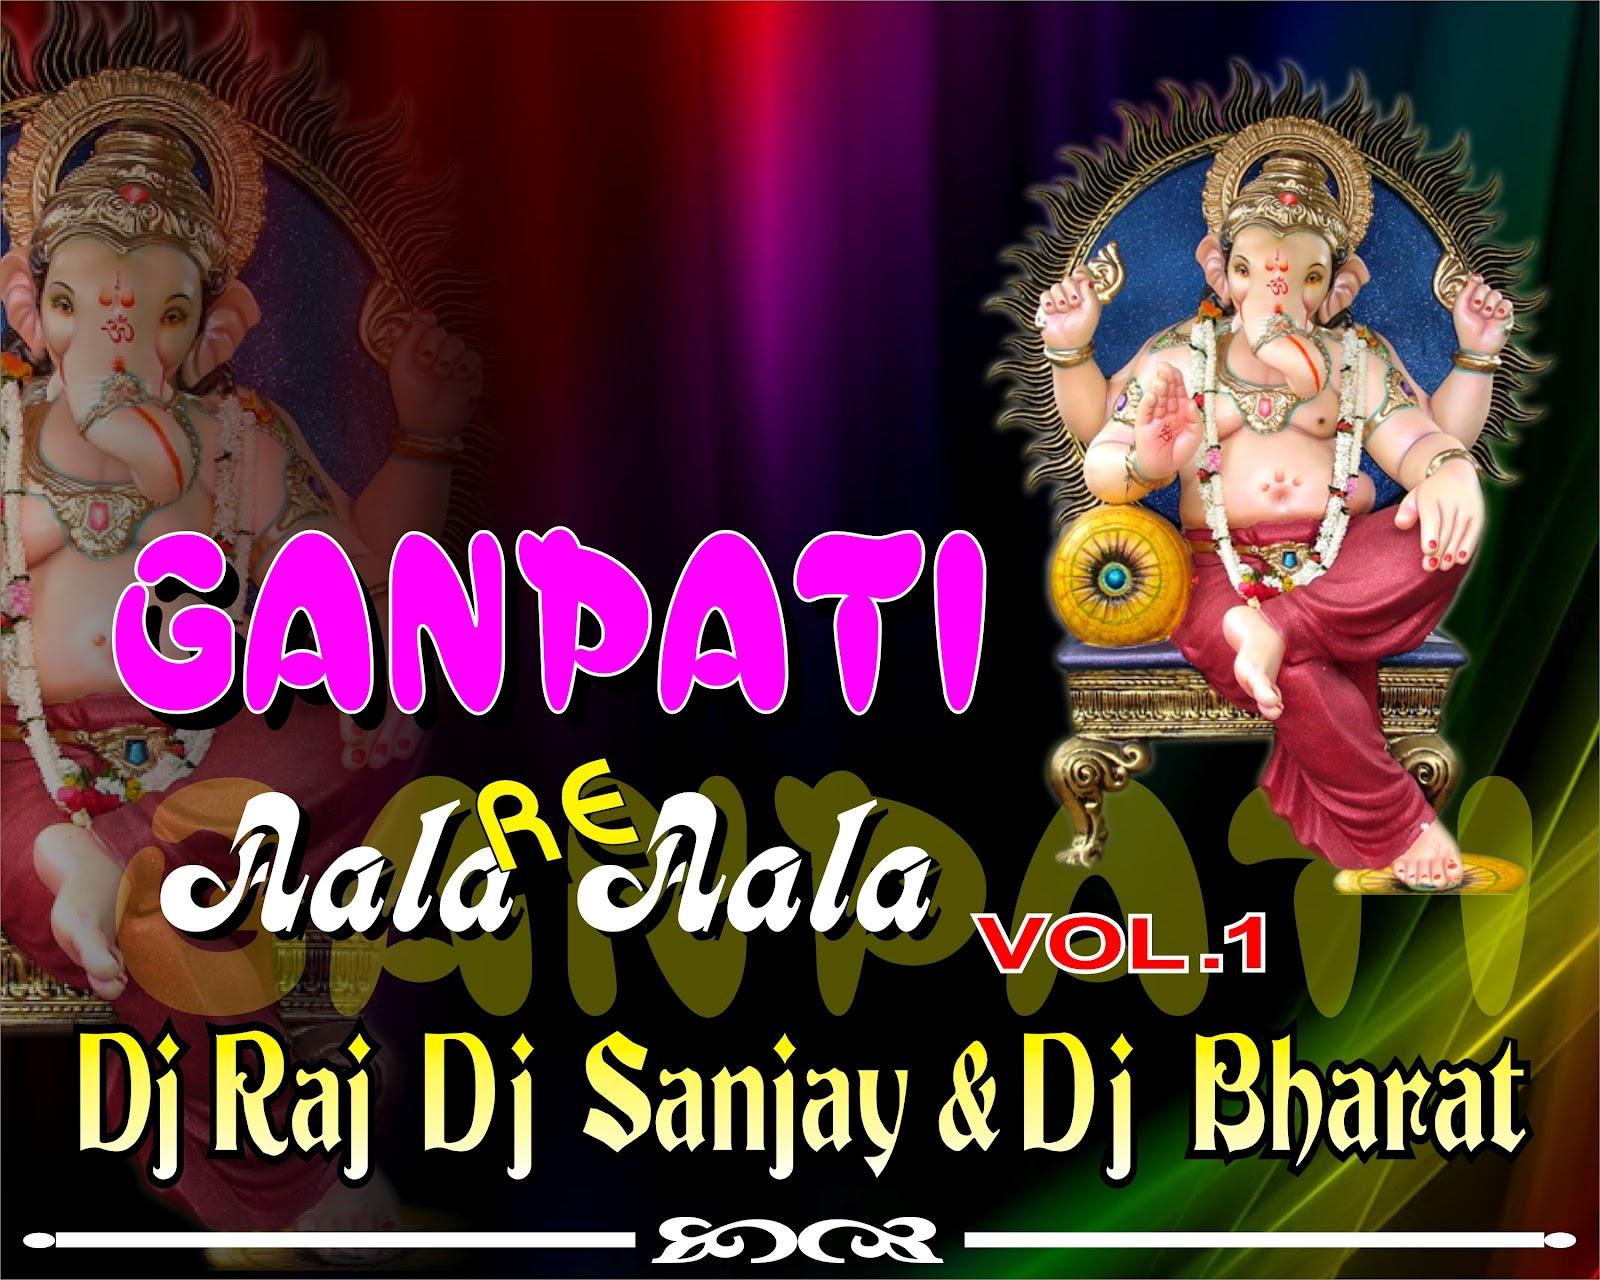 Free marathi dj songs apk download for android | getjar.